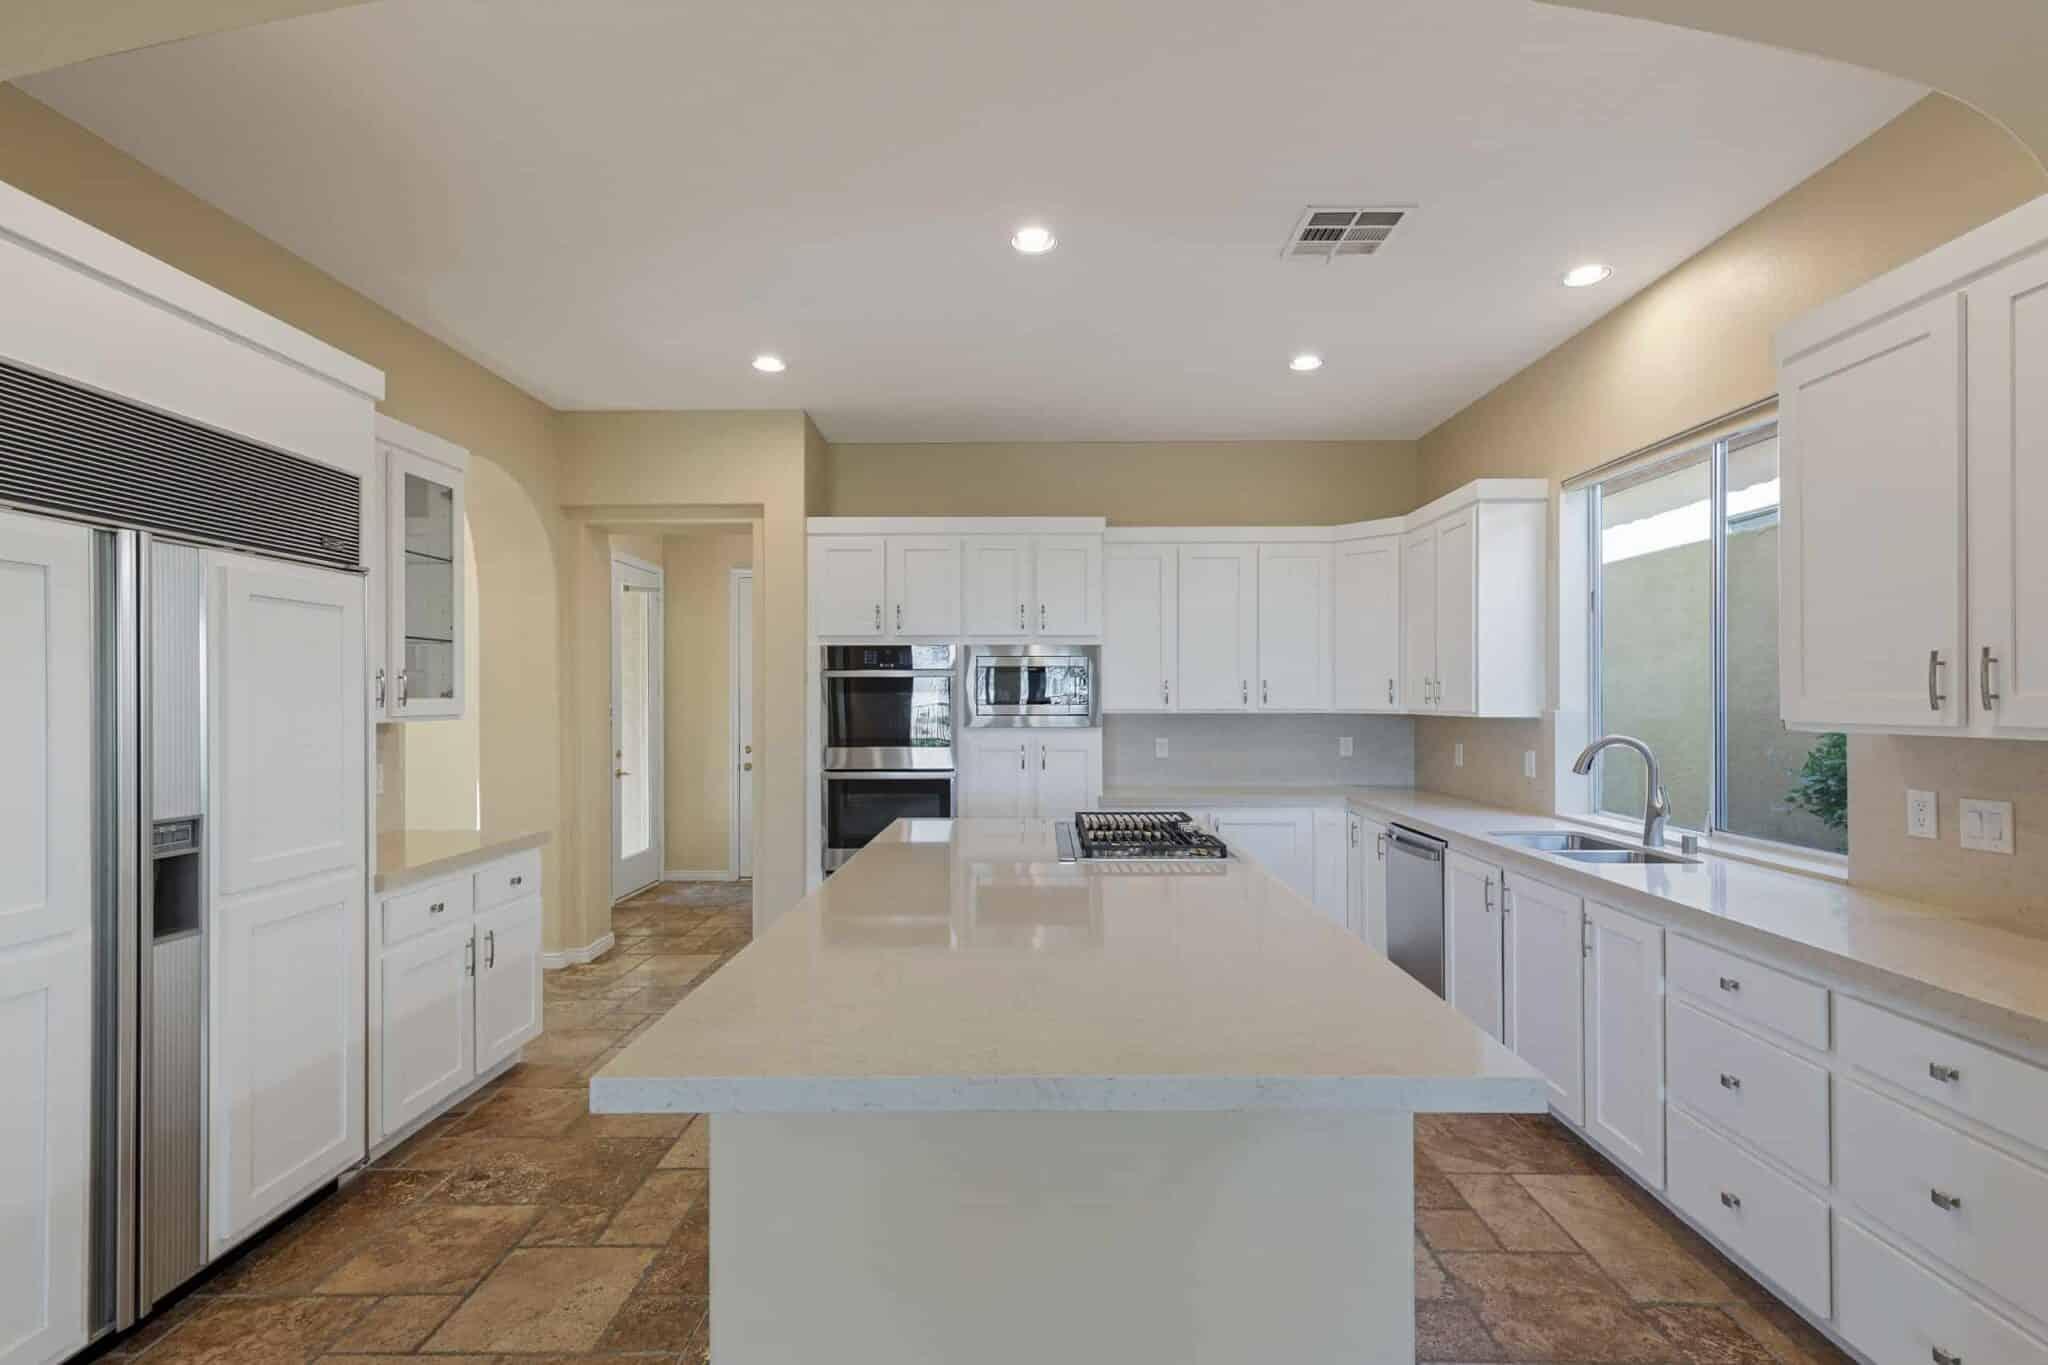 las-vegas-luxry-real-estate-realtor-rob-jensen-company-2620-grassy-spring-place-rrcc28